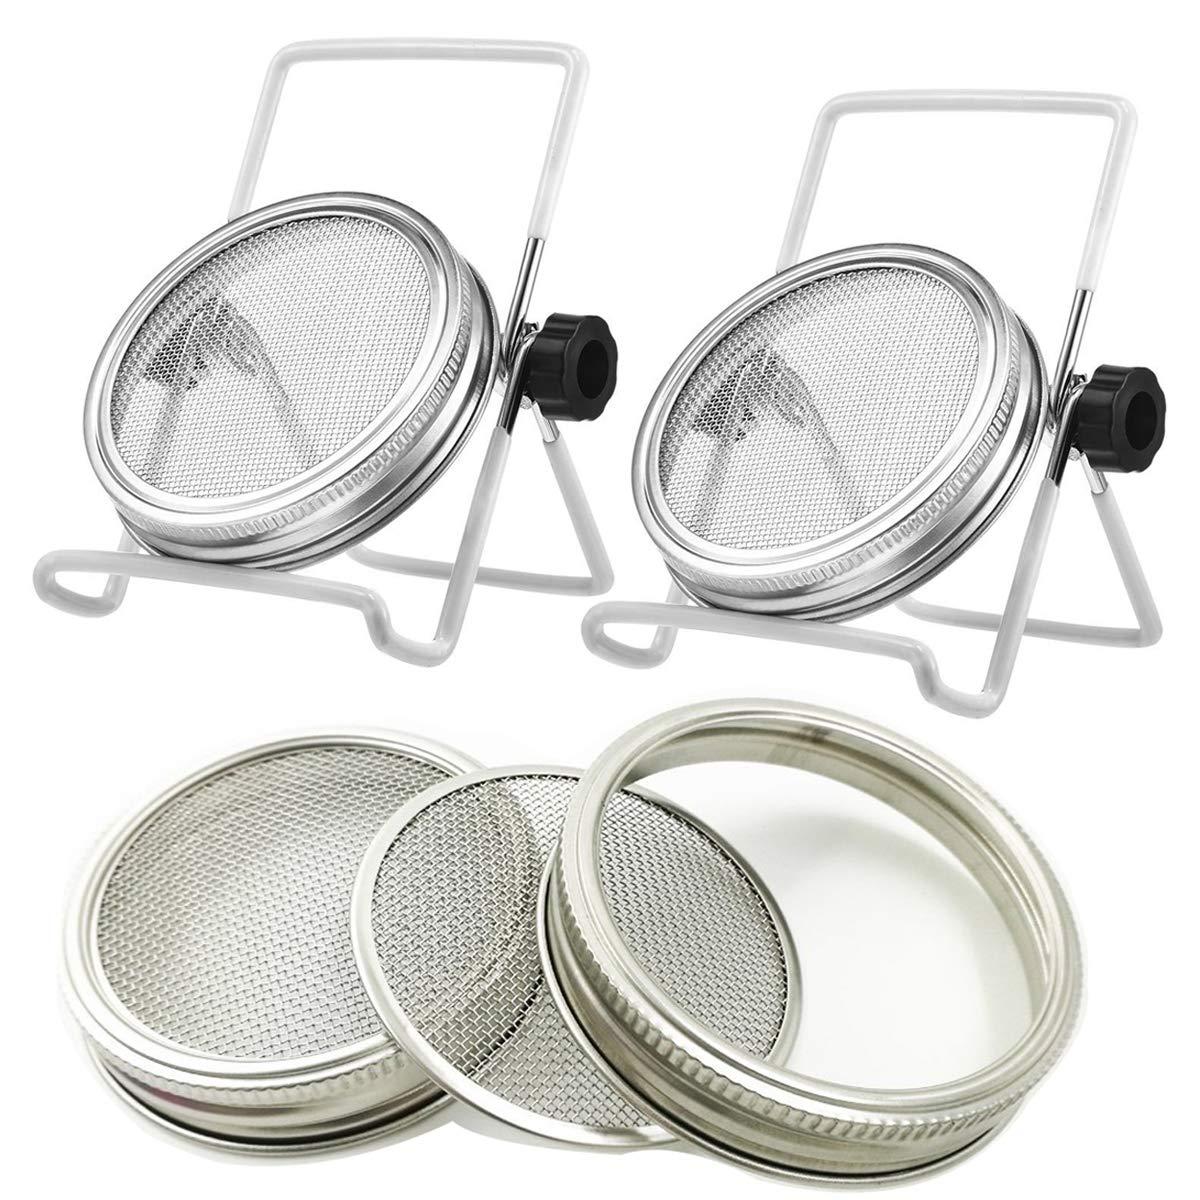 2 Pcs Stainless Steel Mason Jar Sprouting Jar Lids with 2 Pcs Stainless Steel Sprouting Stands for Wide Mouth Mason Jars Canning Jars (White) by NM